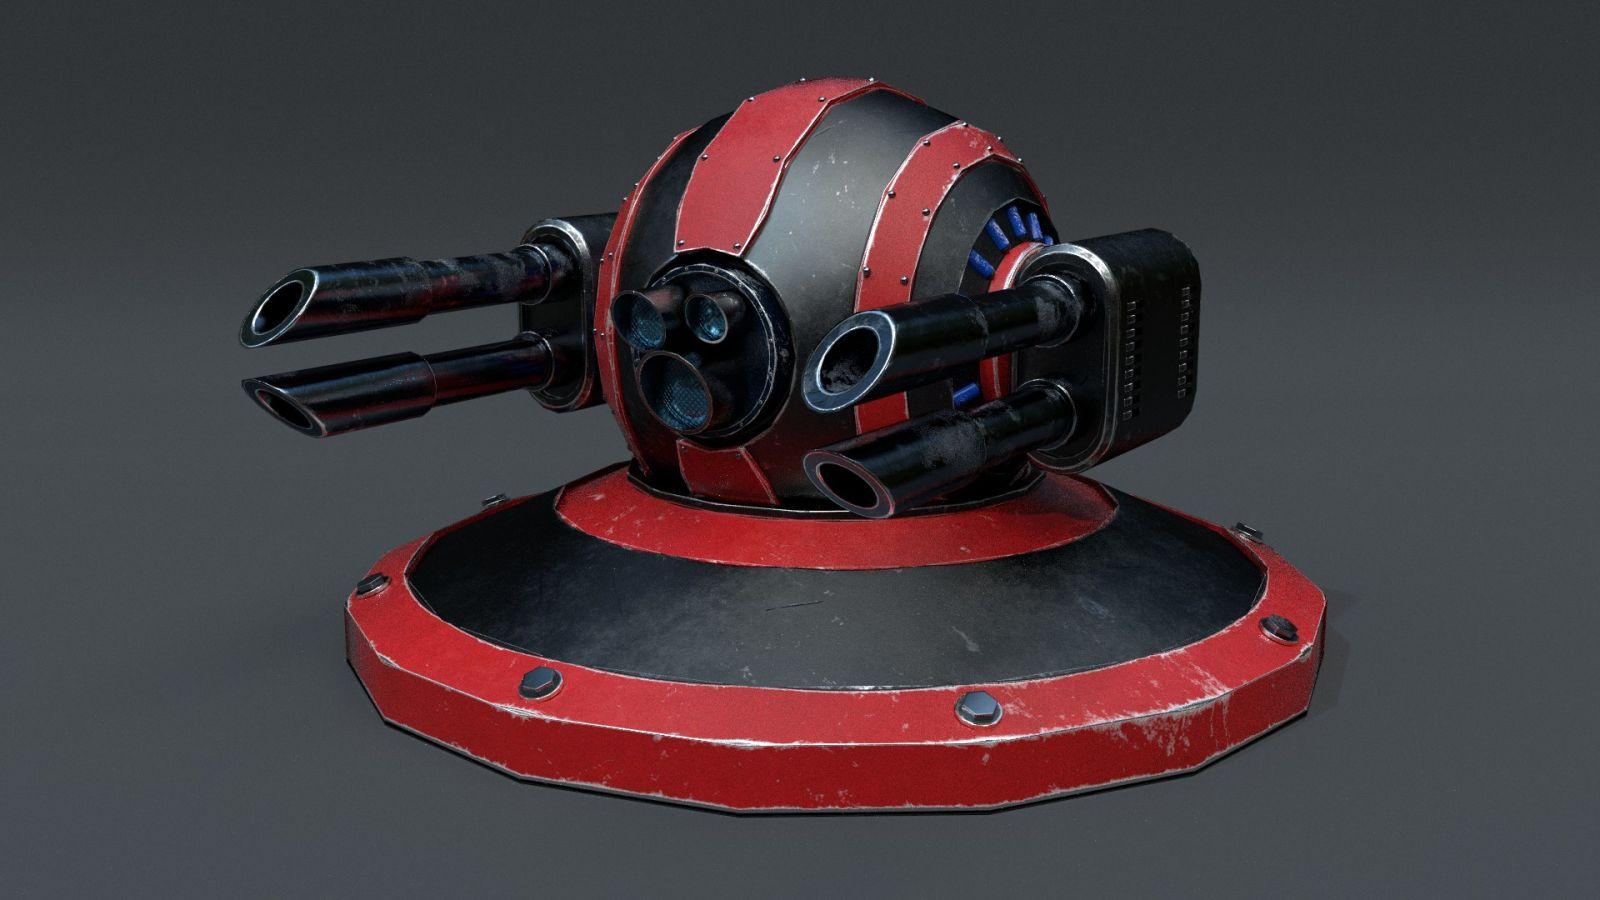 TurretV2